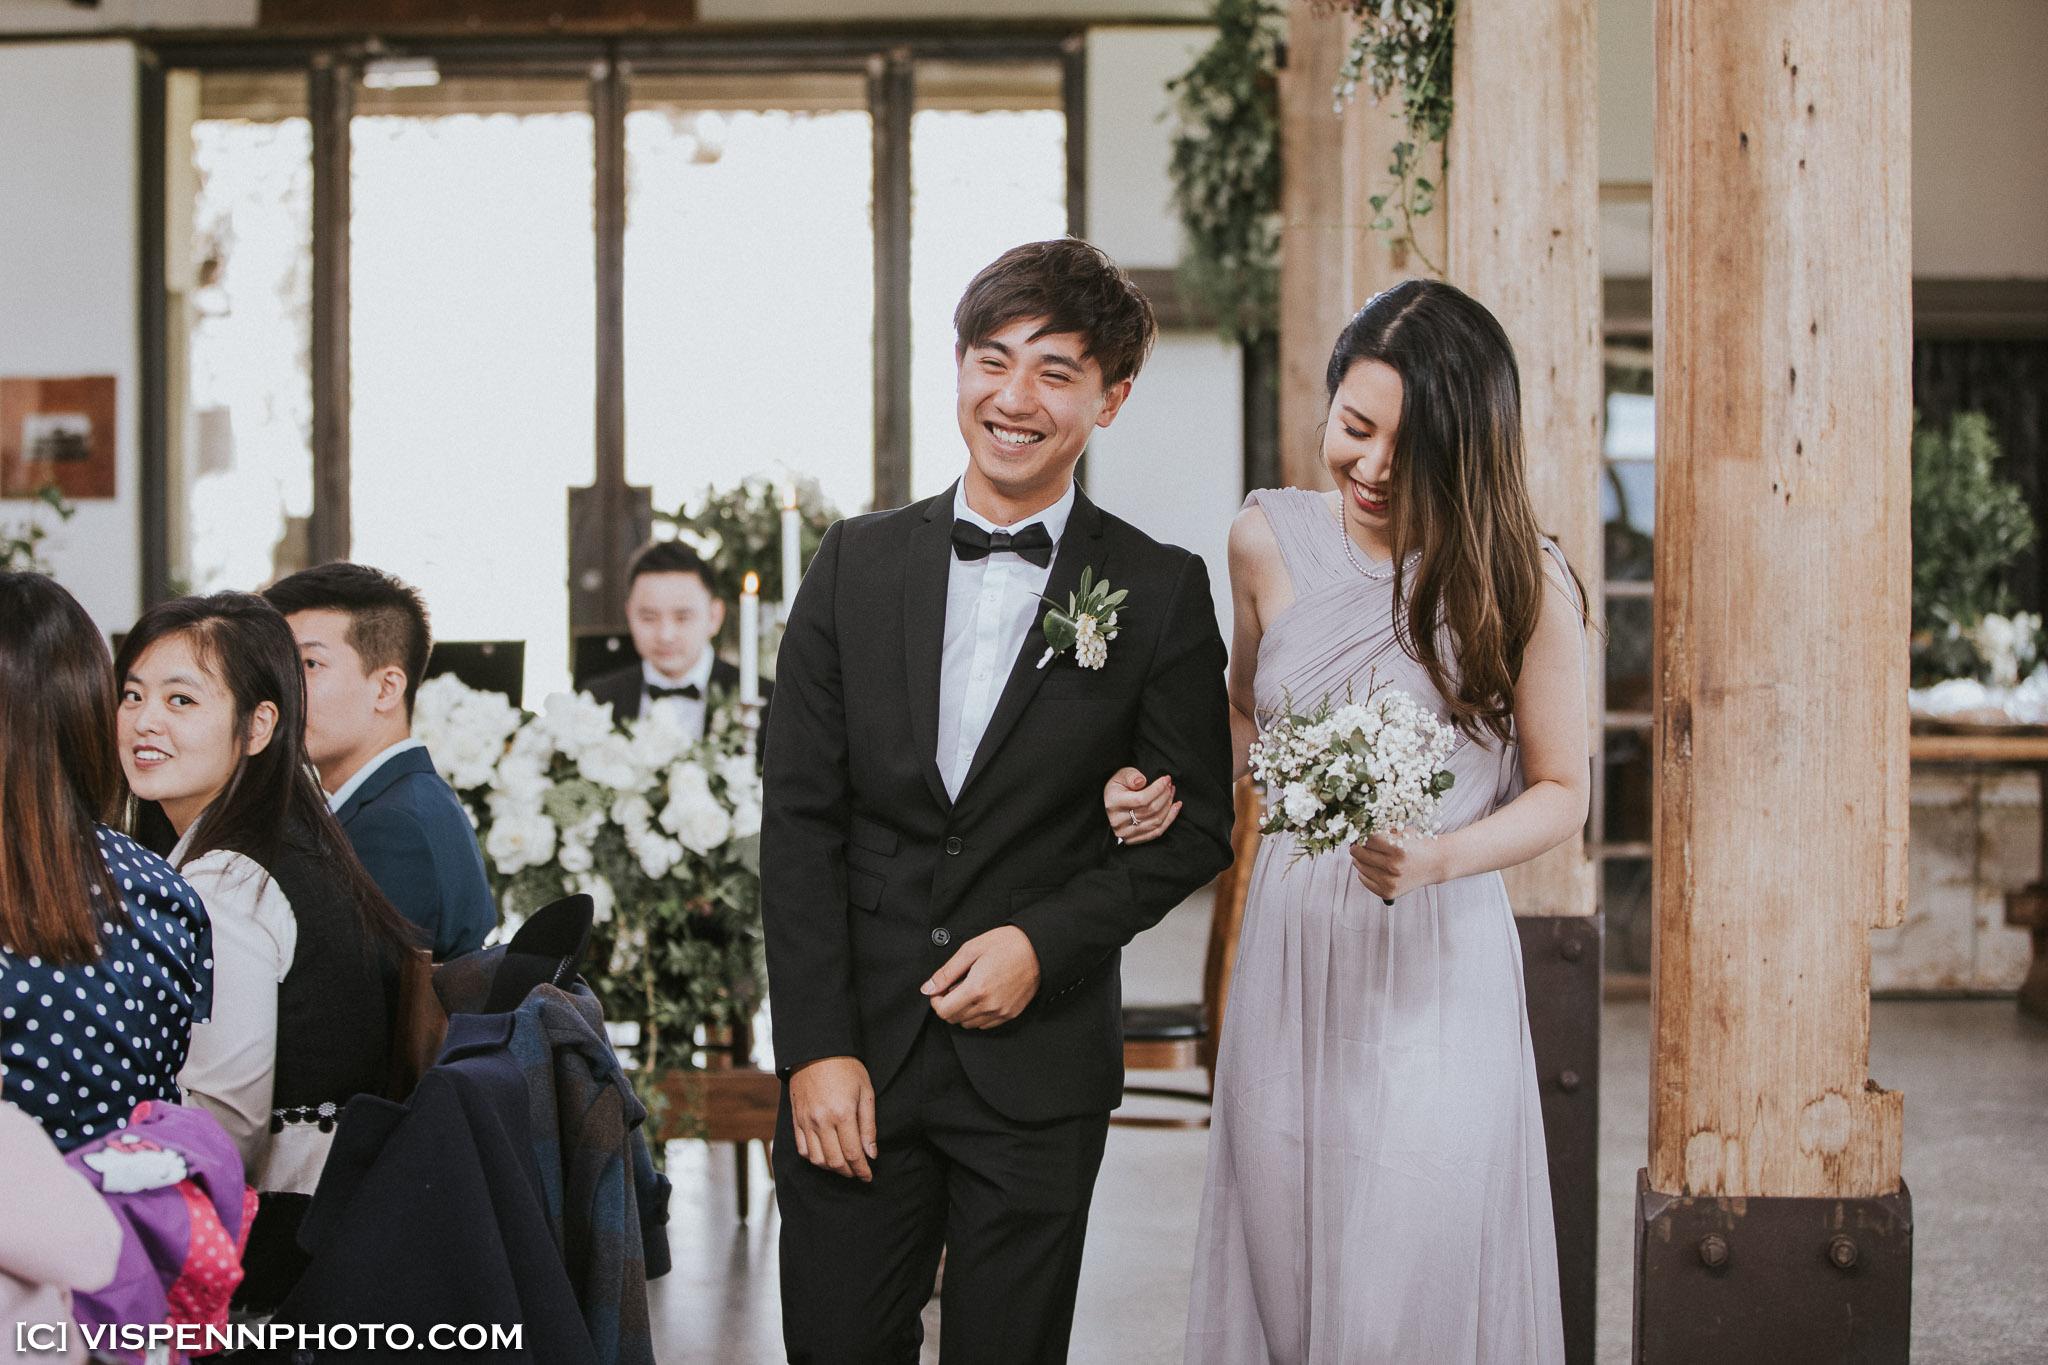 WEDDING DAY Photography Melbourne VISPENN 墨尔本 婚礼跟拍 婚礼摄像 婚礼摄影 结婚照 登记照 LeanneWesley 07967 2P 1DX VISPENN